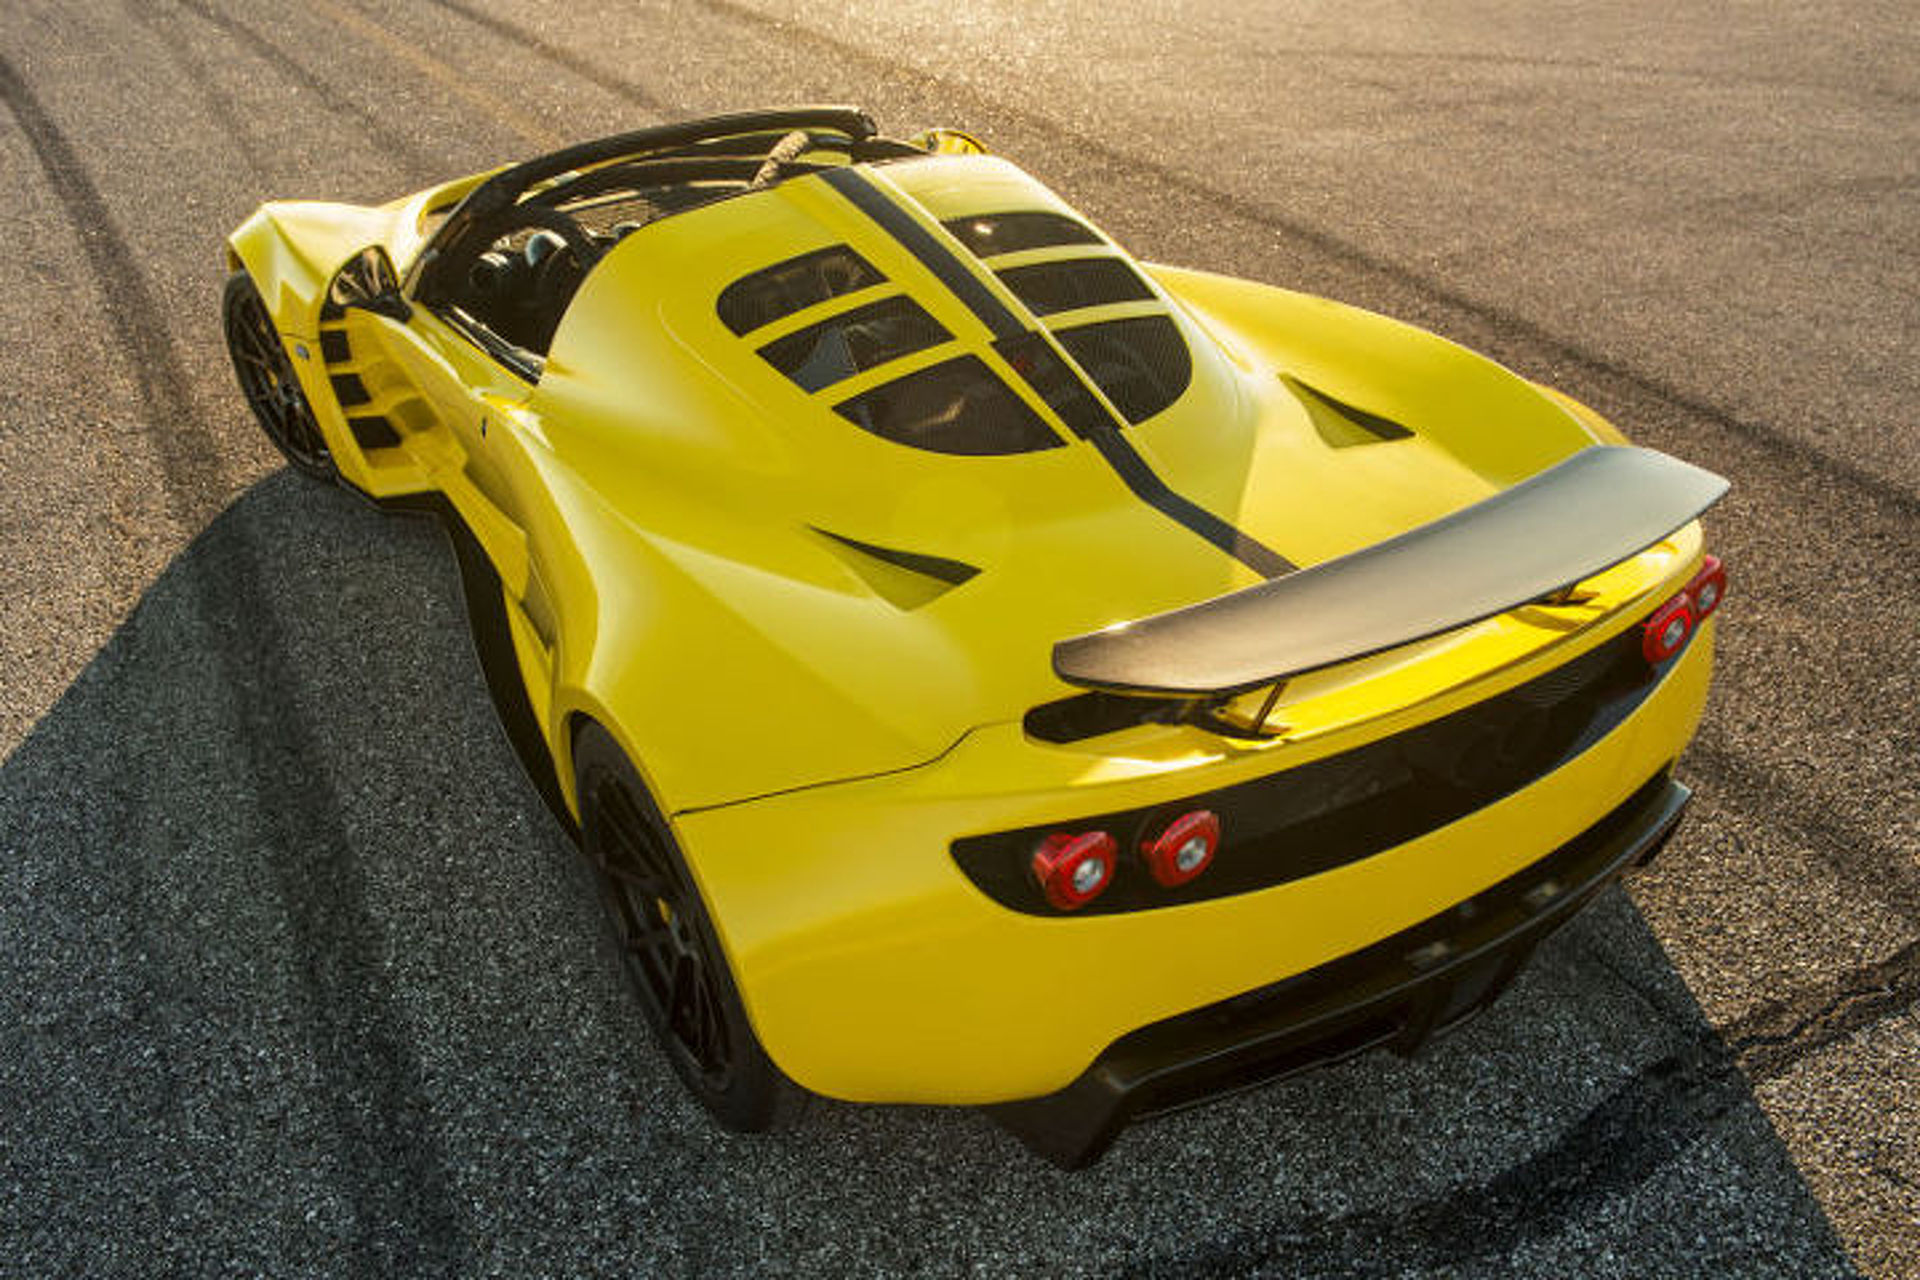 Hennessey Venom GT Spyder Puts out A Ridiculous 1451 Horsepower